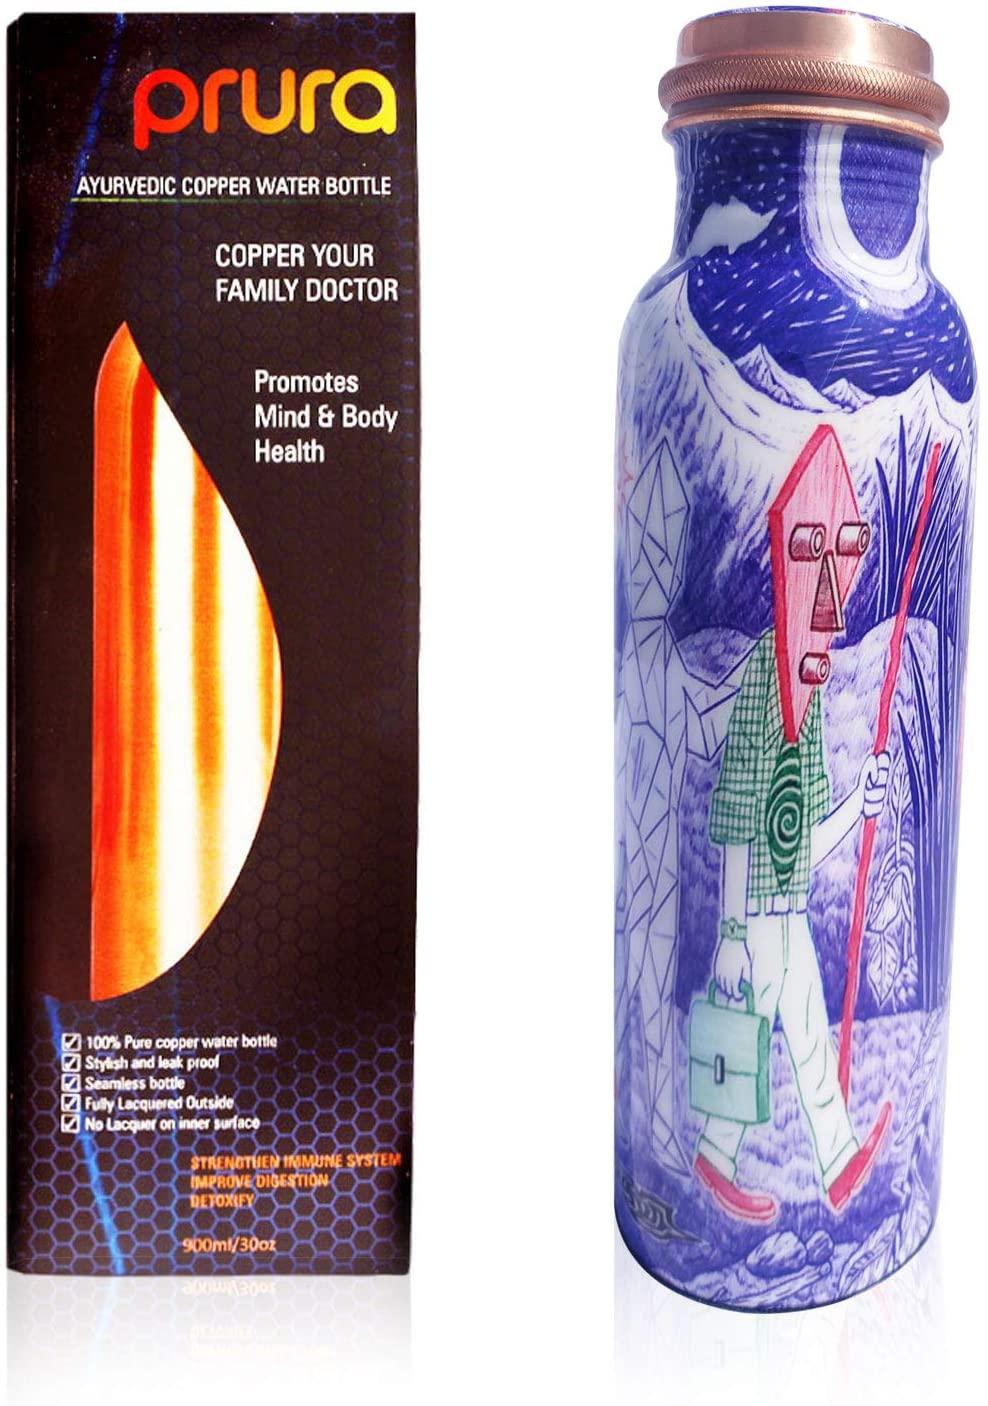 PRURA Copper Water Bottle A Leak Proof Ayurvedic Pure Copper Flask